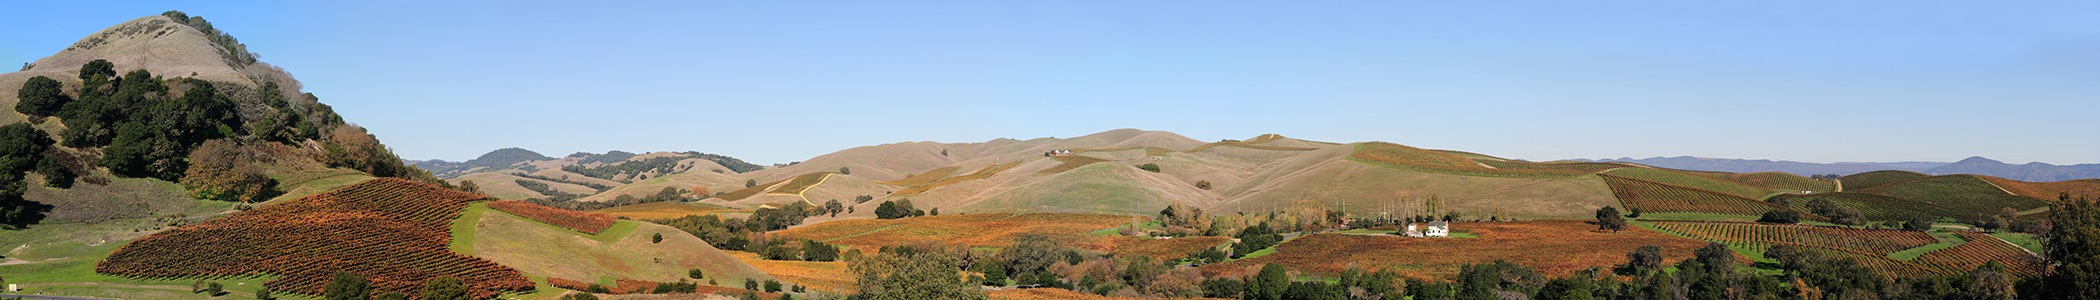 Napa Valley – Travel guide at Wikivoyage